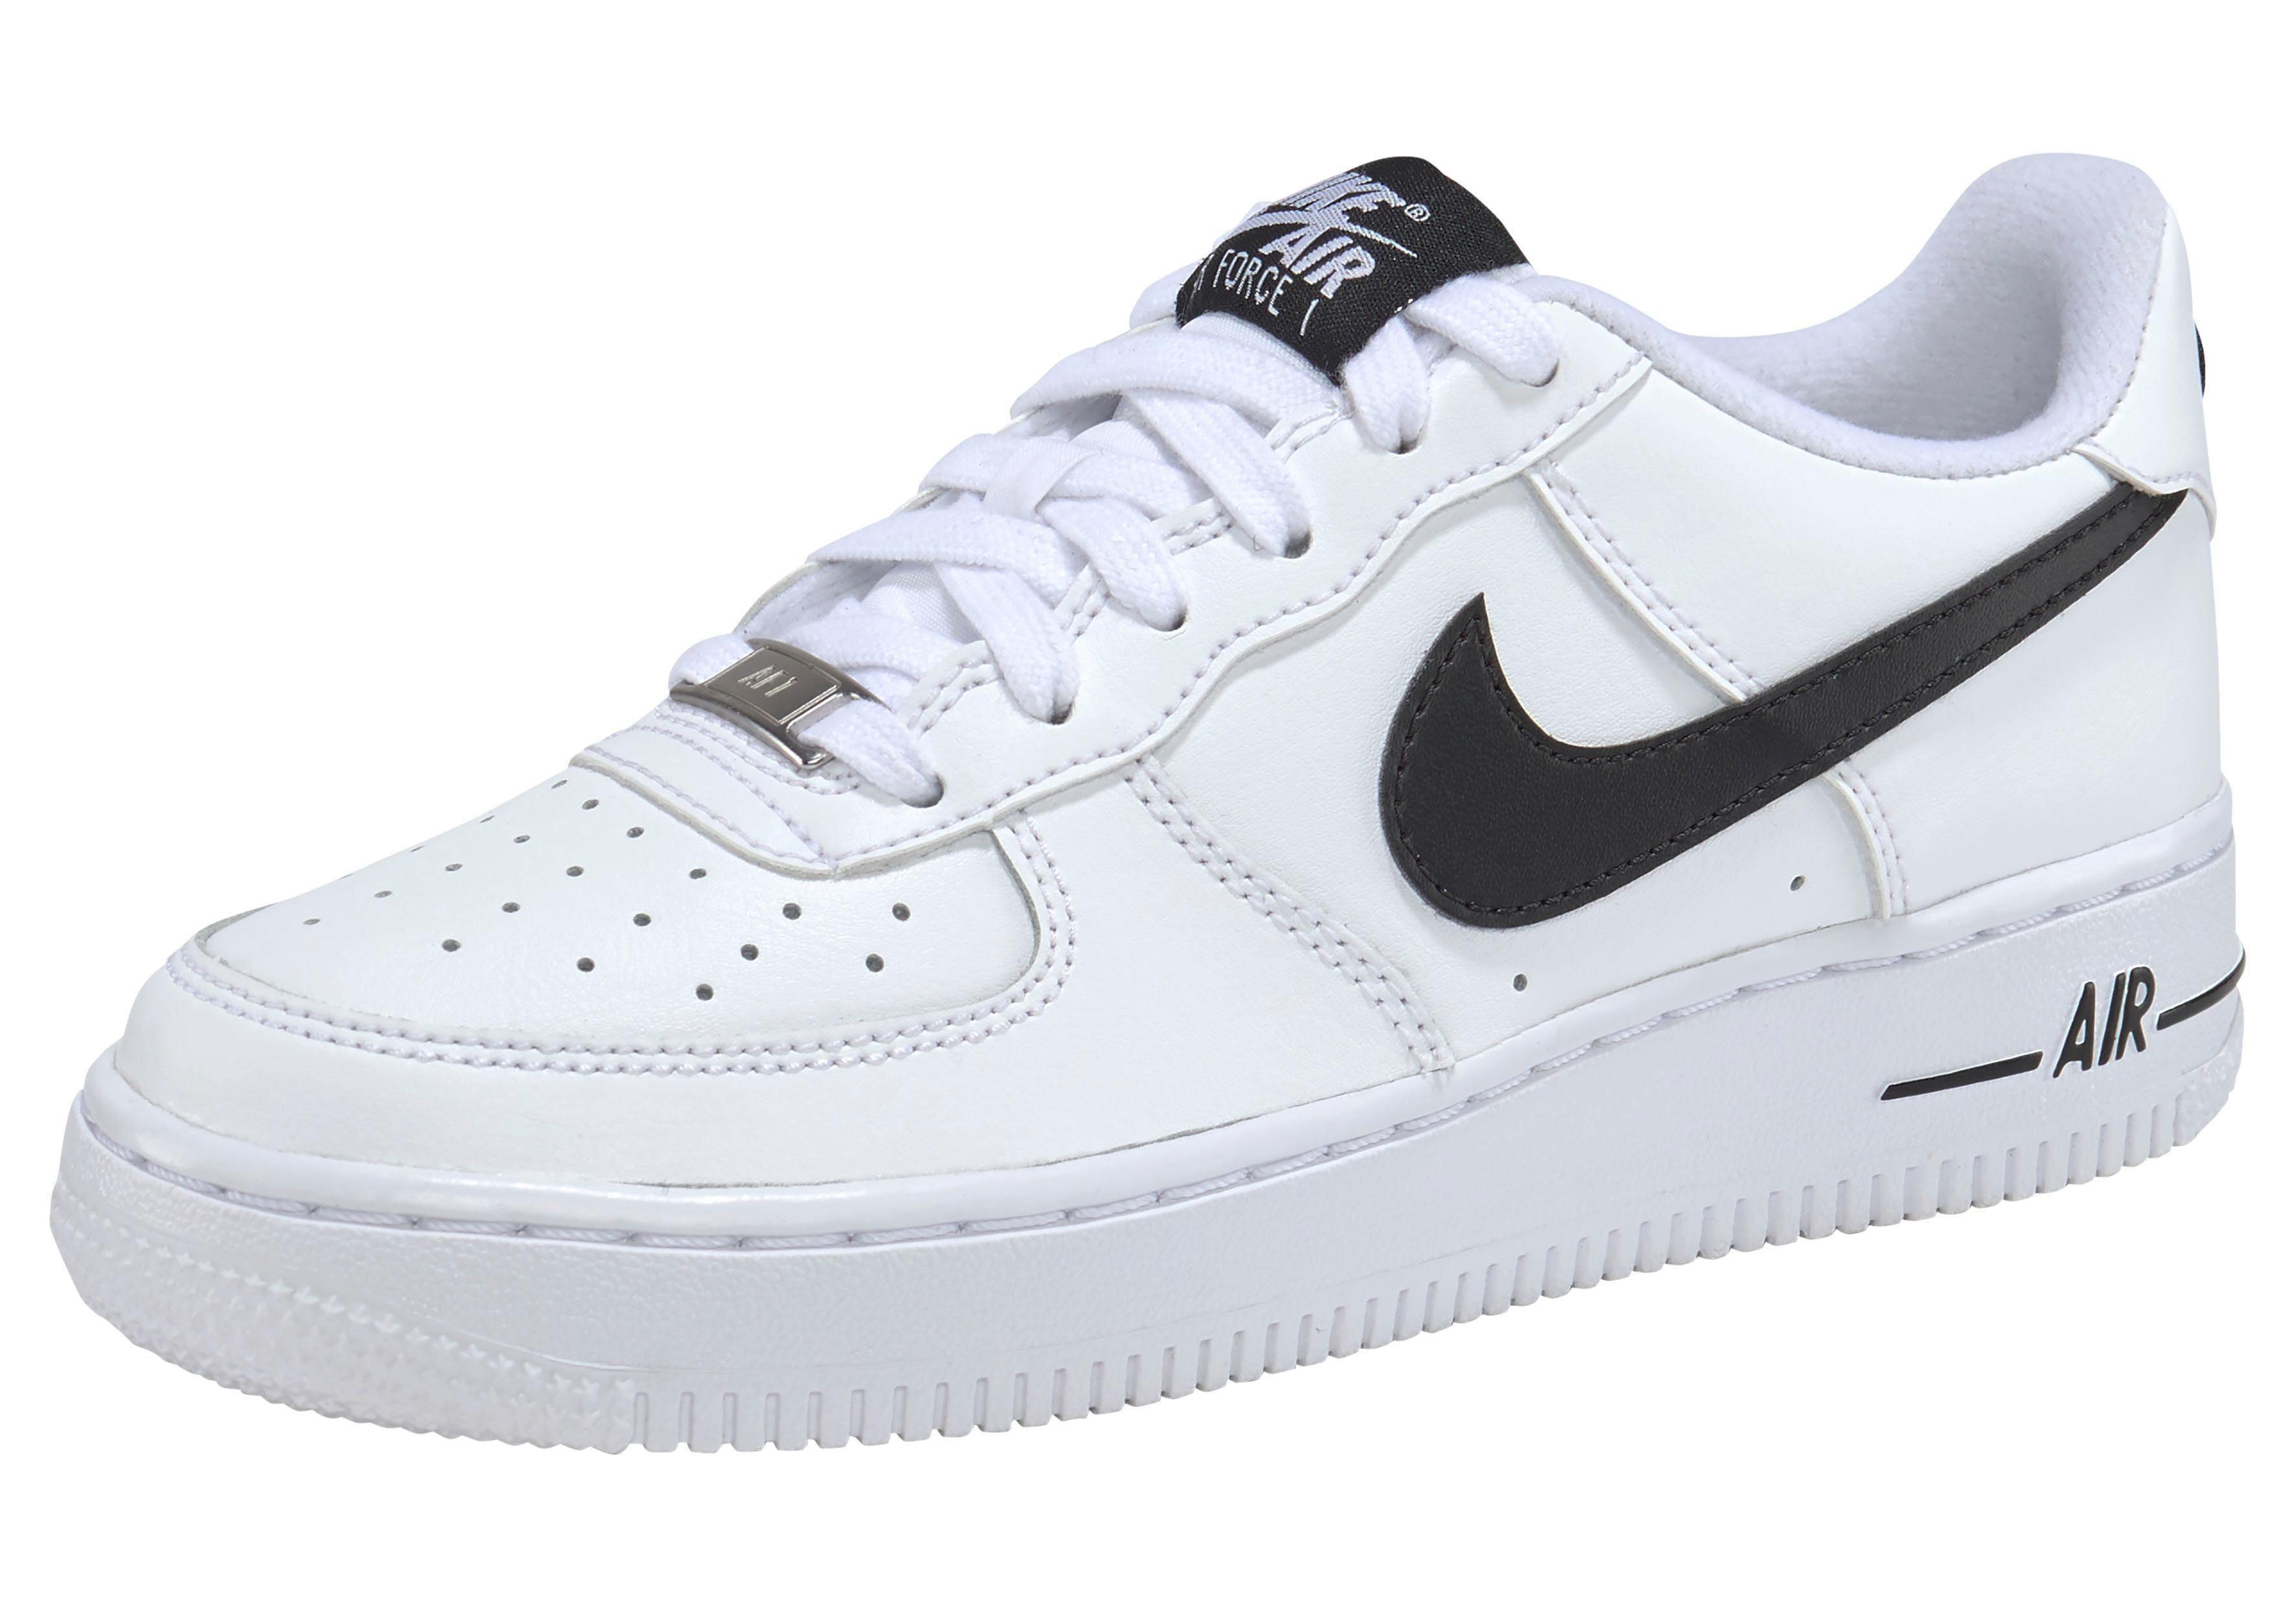 Nike Sportswear »AIR FORCE 1« Sneaker, Modischer Sneaker von